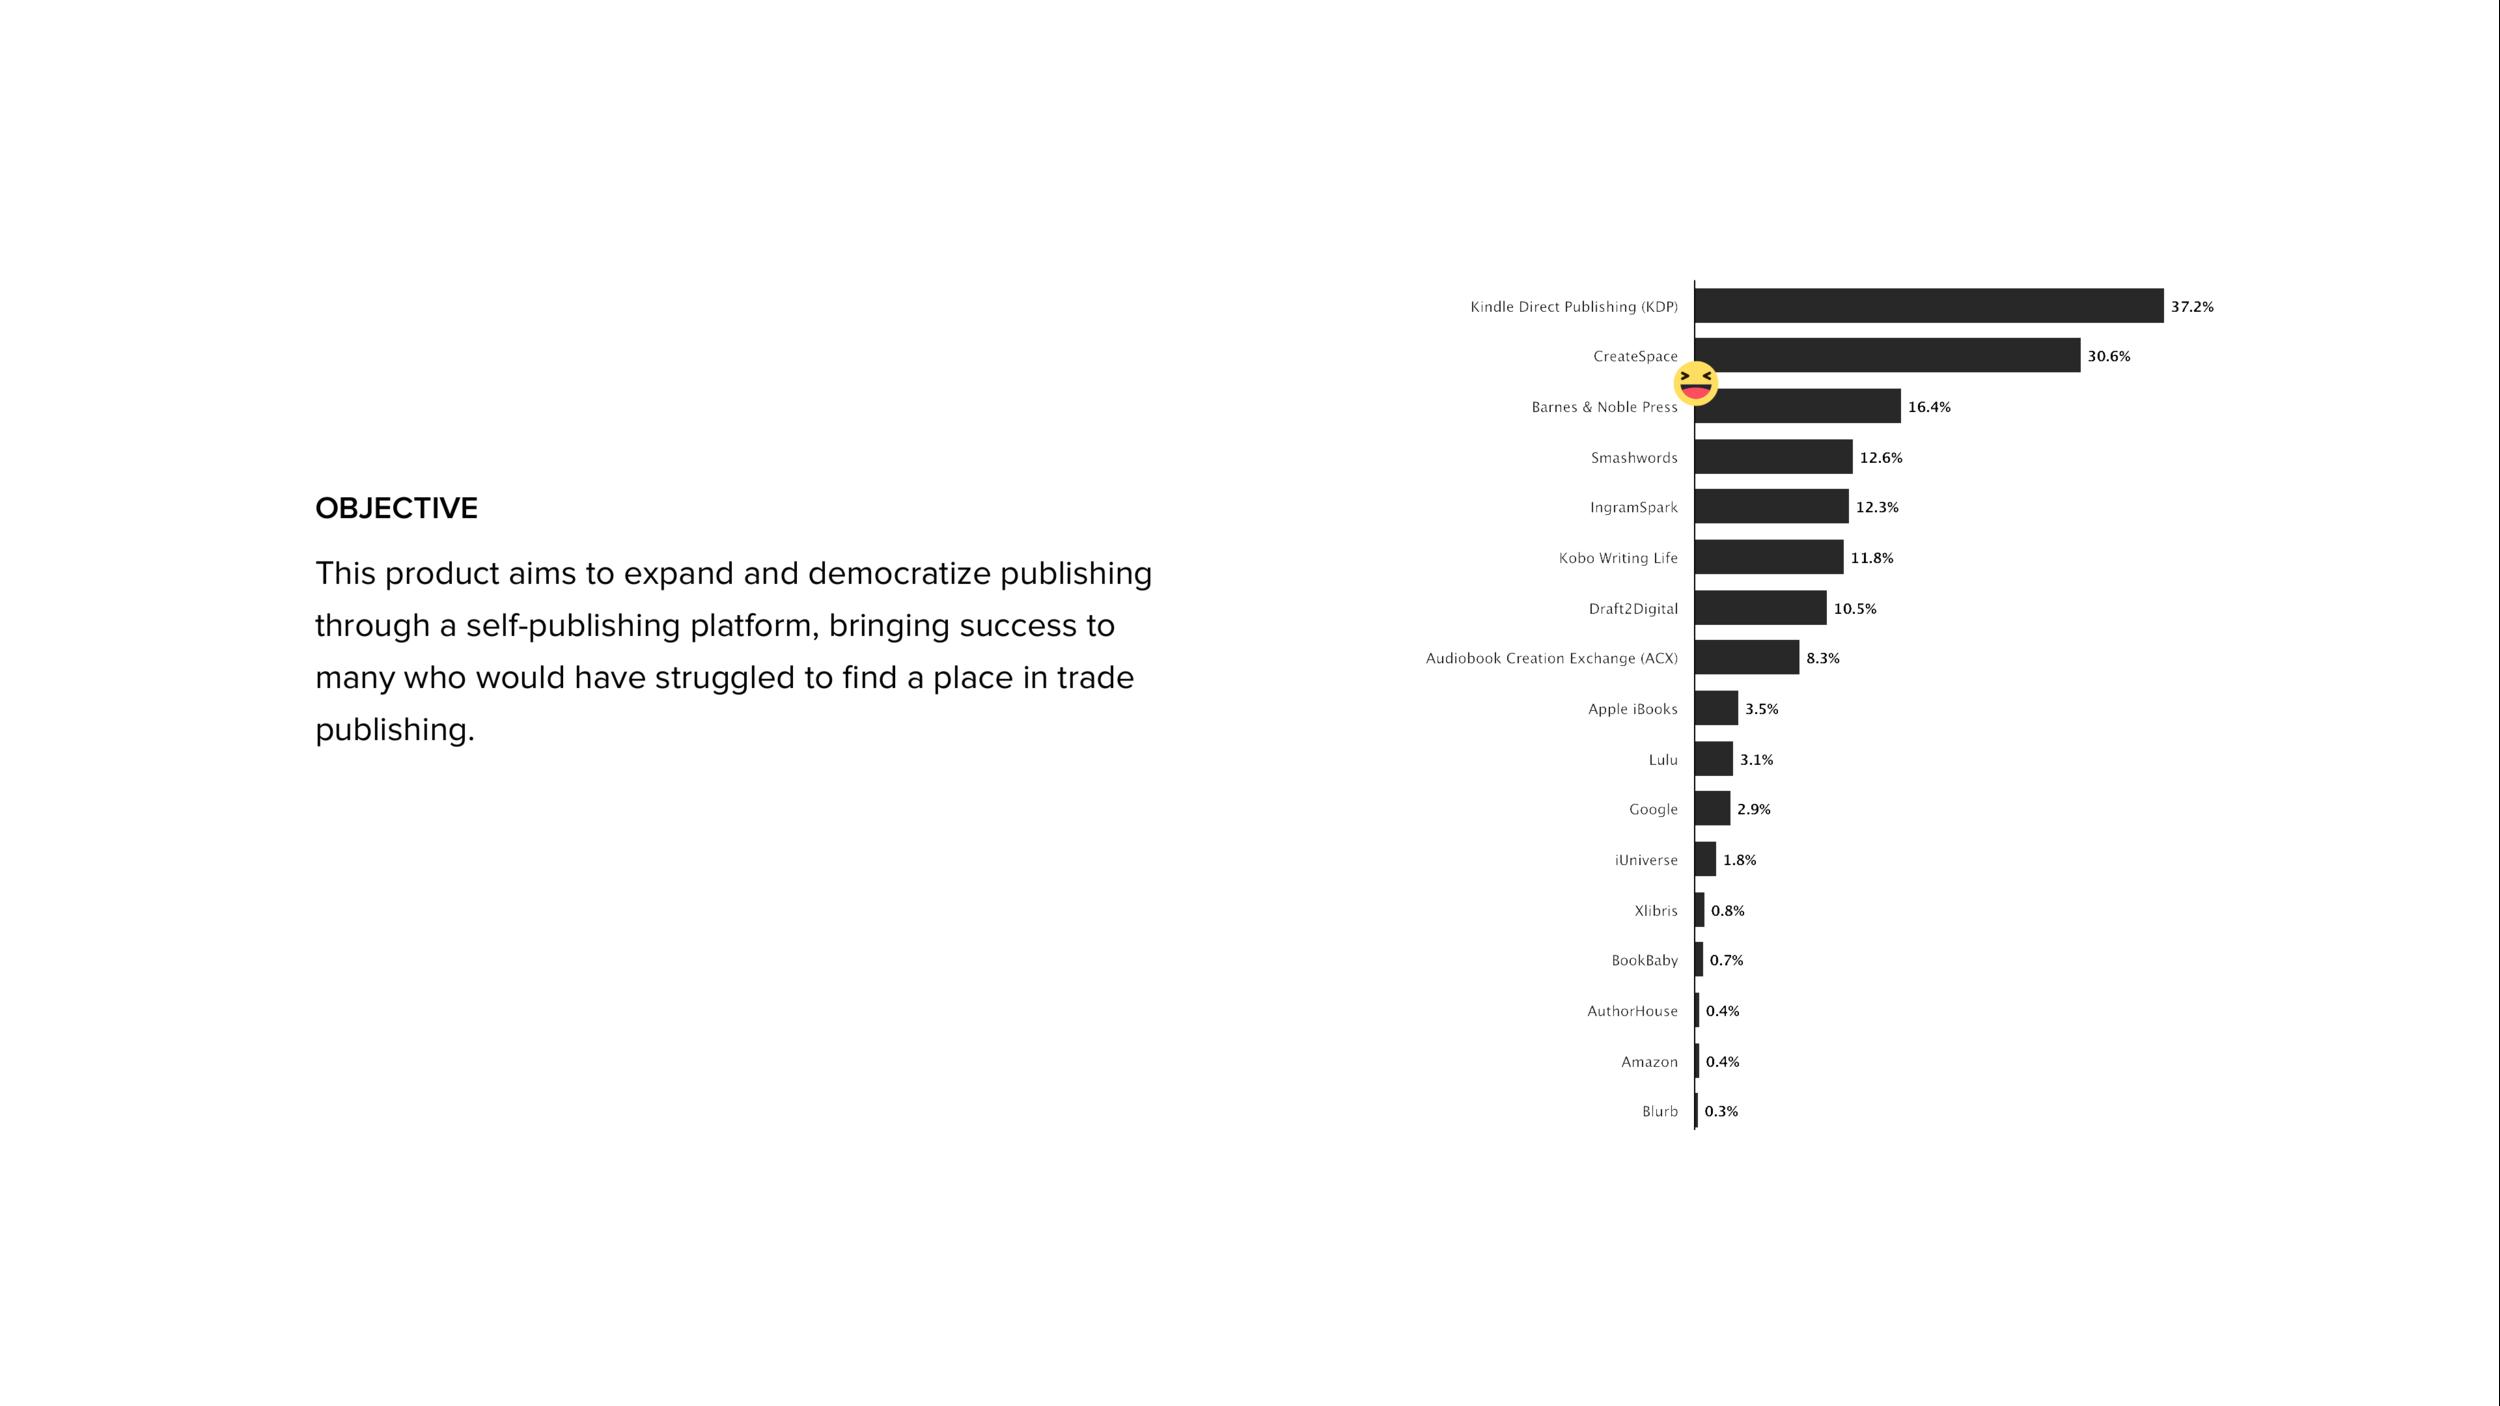 Slide 1: Overall objective and KPI.